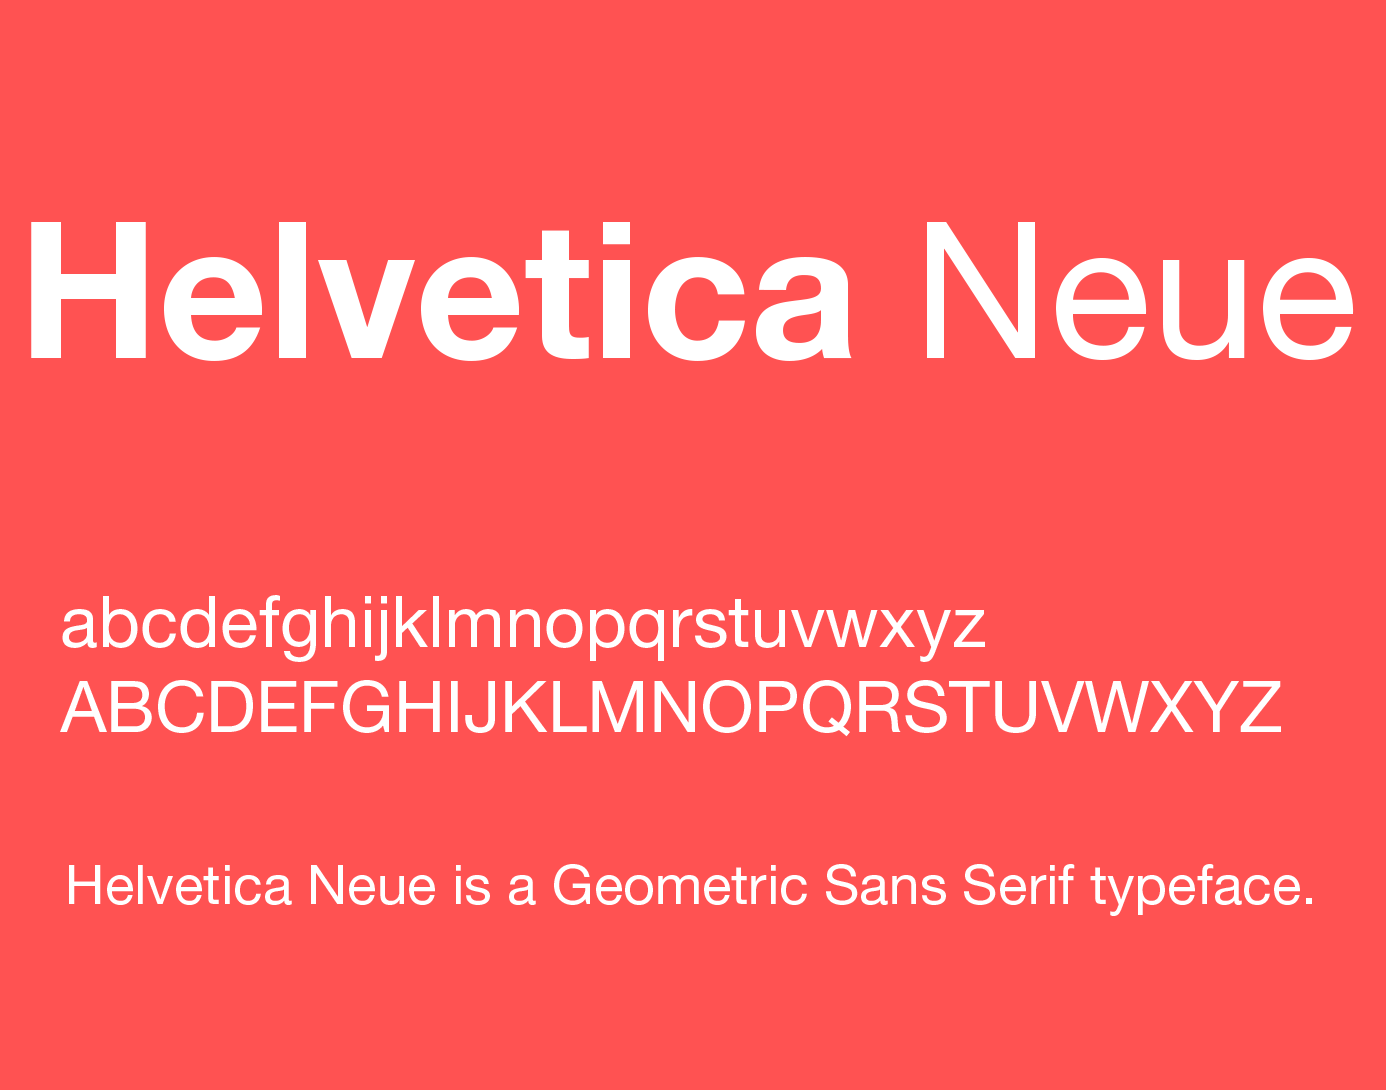 helvetica neue font free download mac